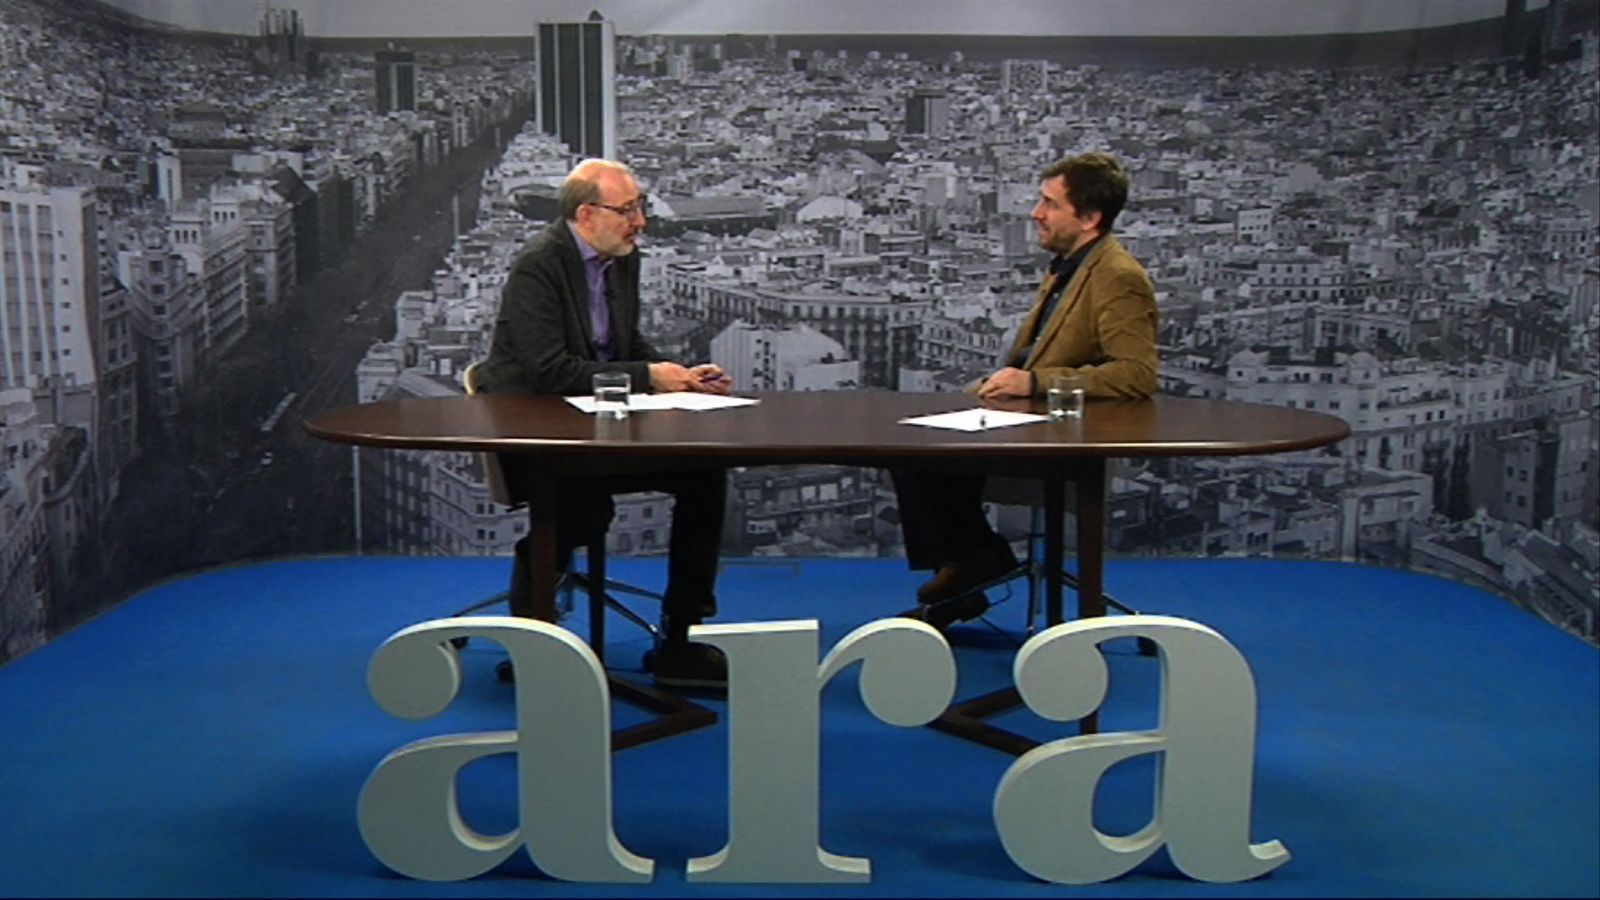 Entrevista d'Antoni Bassas a Toni Comín